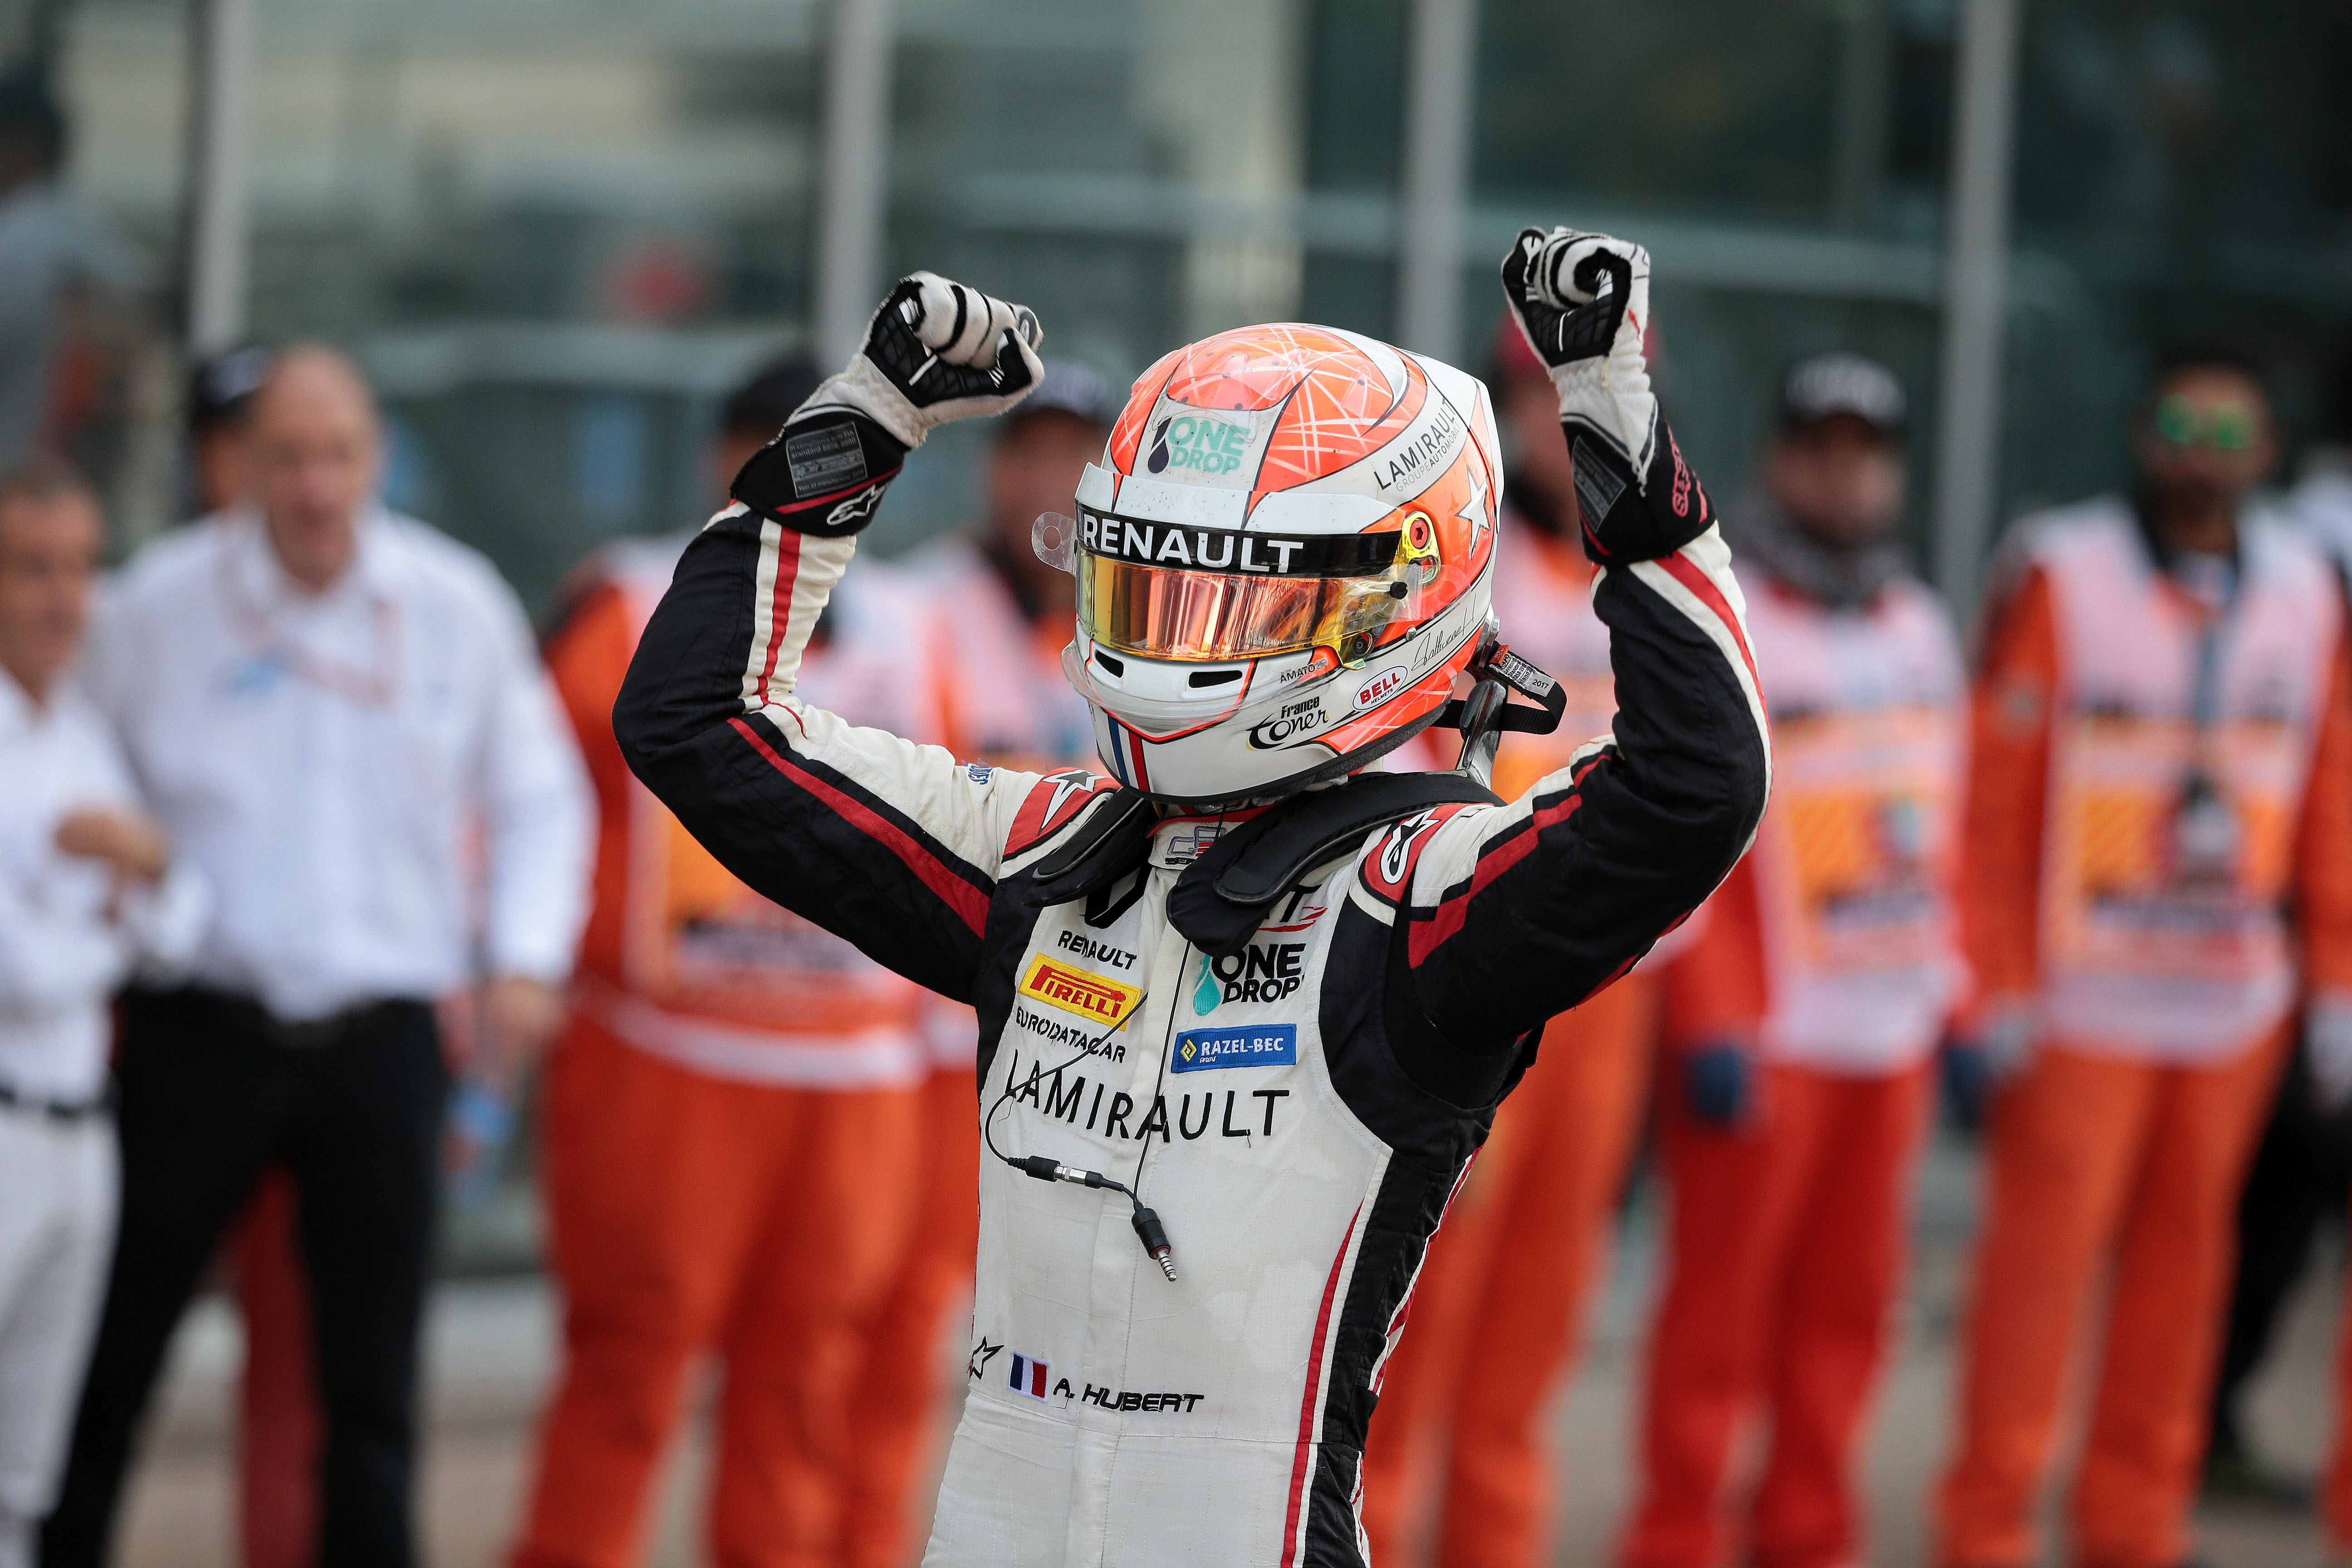 Anthoine Hubert wins 2018 GP3 title